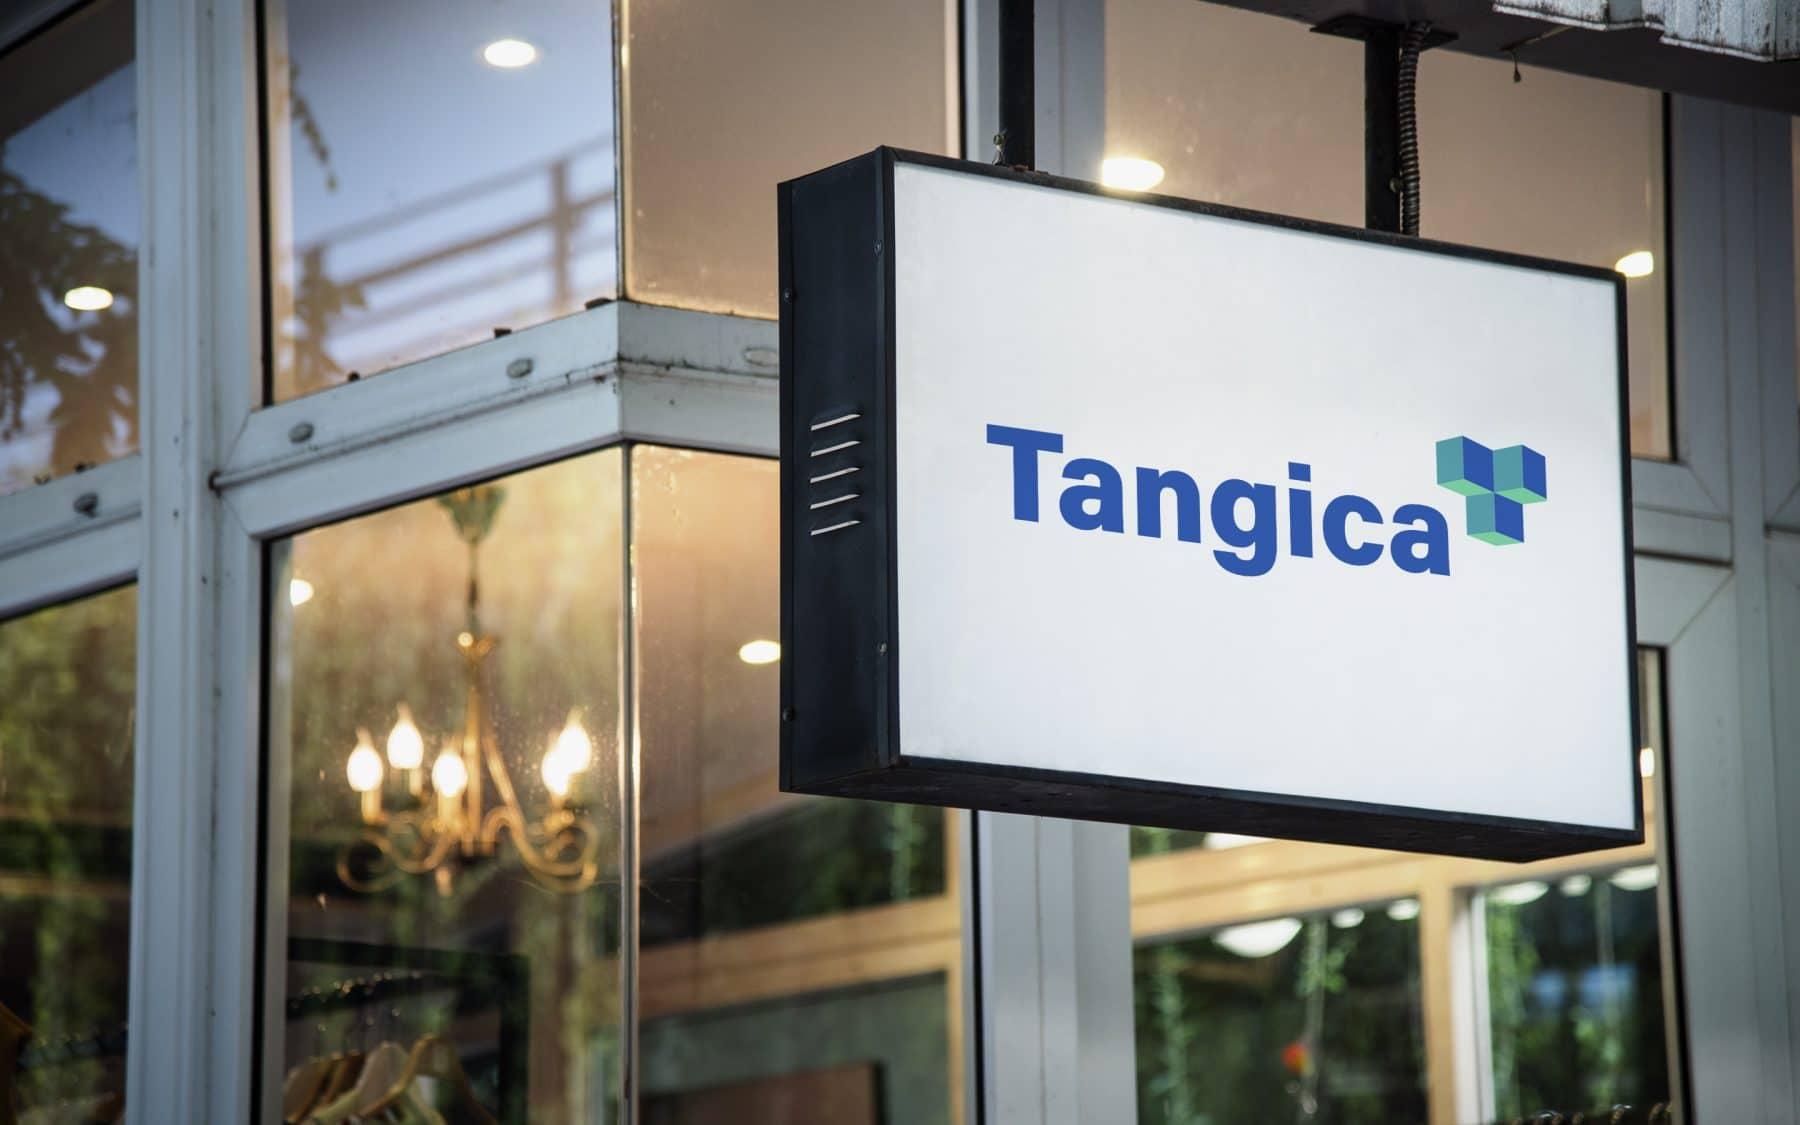 Tangica 3